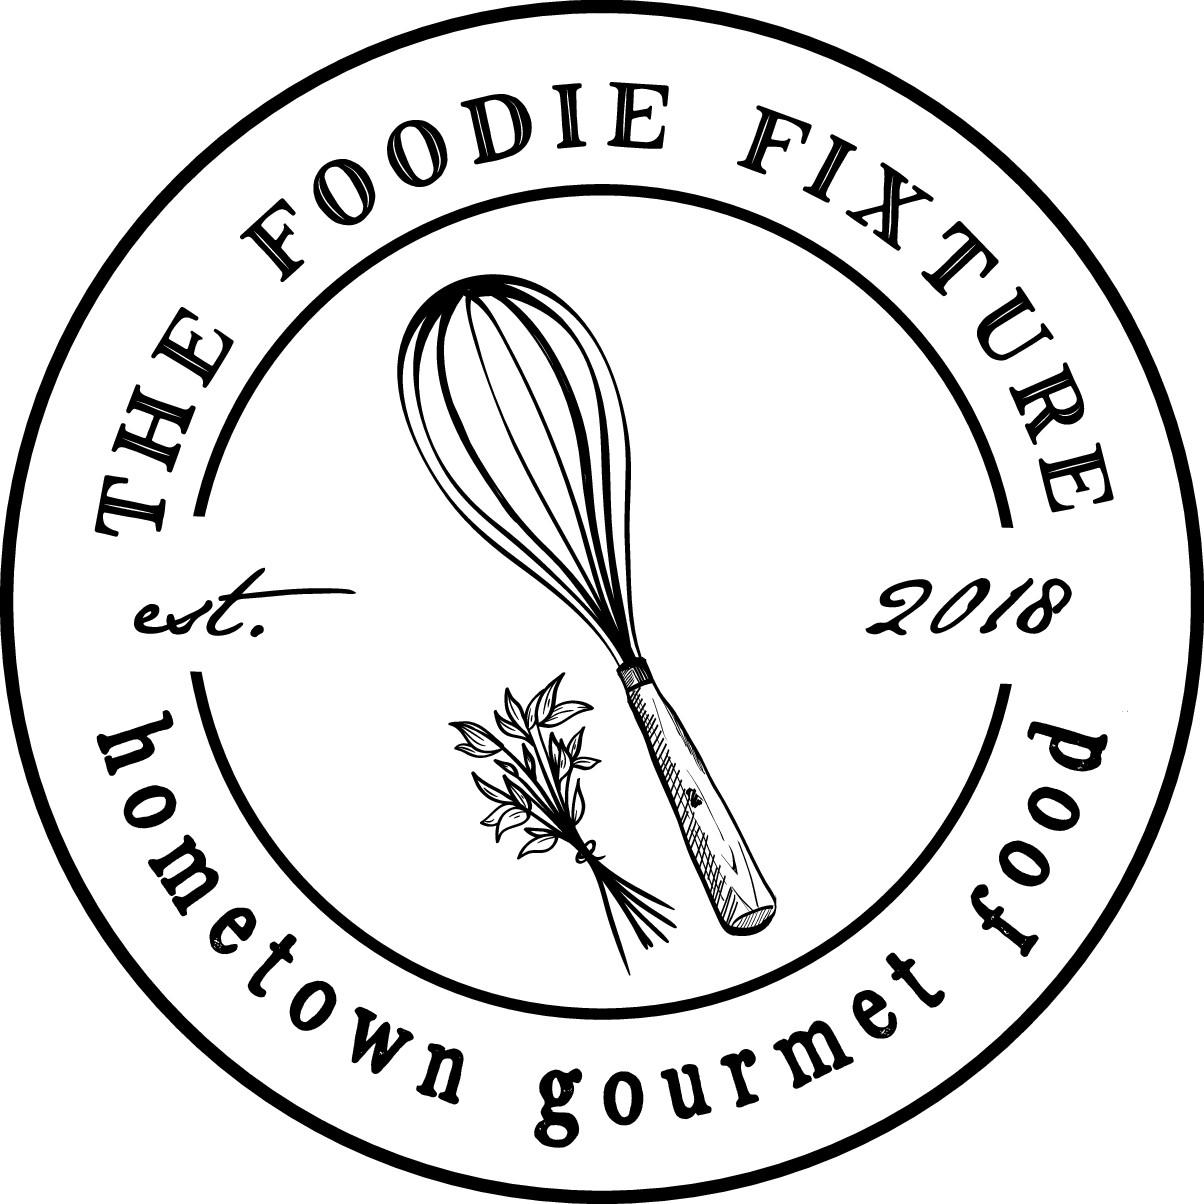 The Foodie Fixture